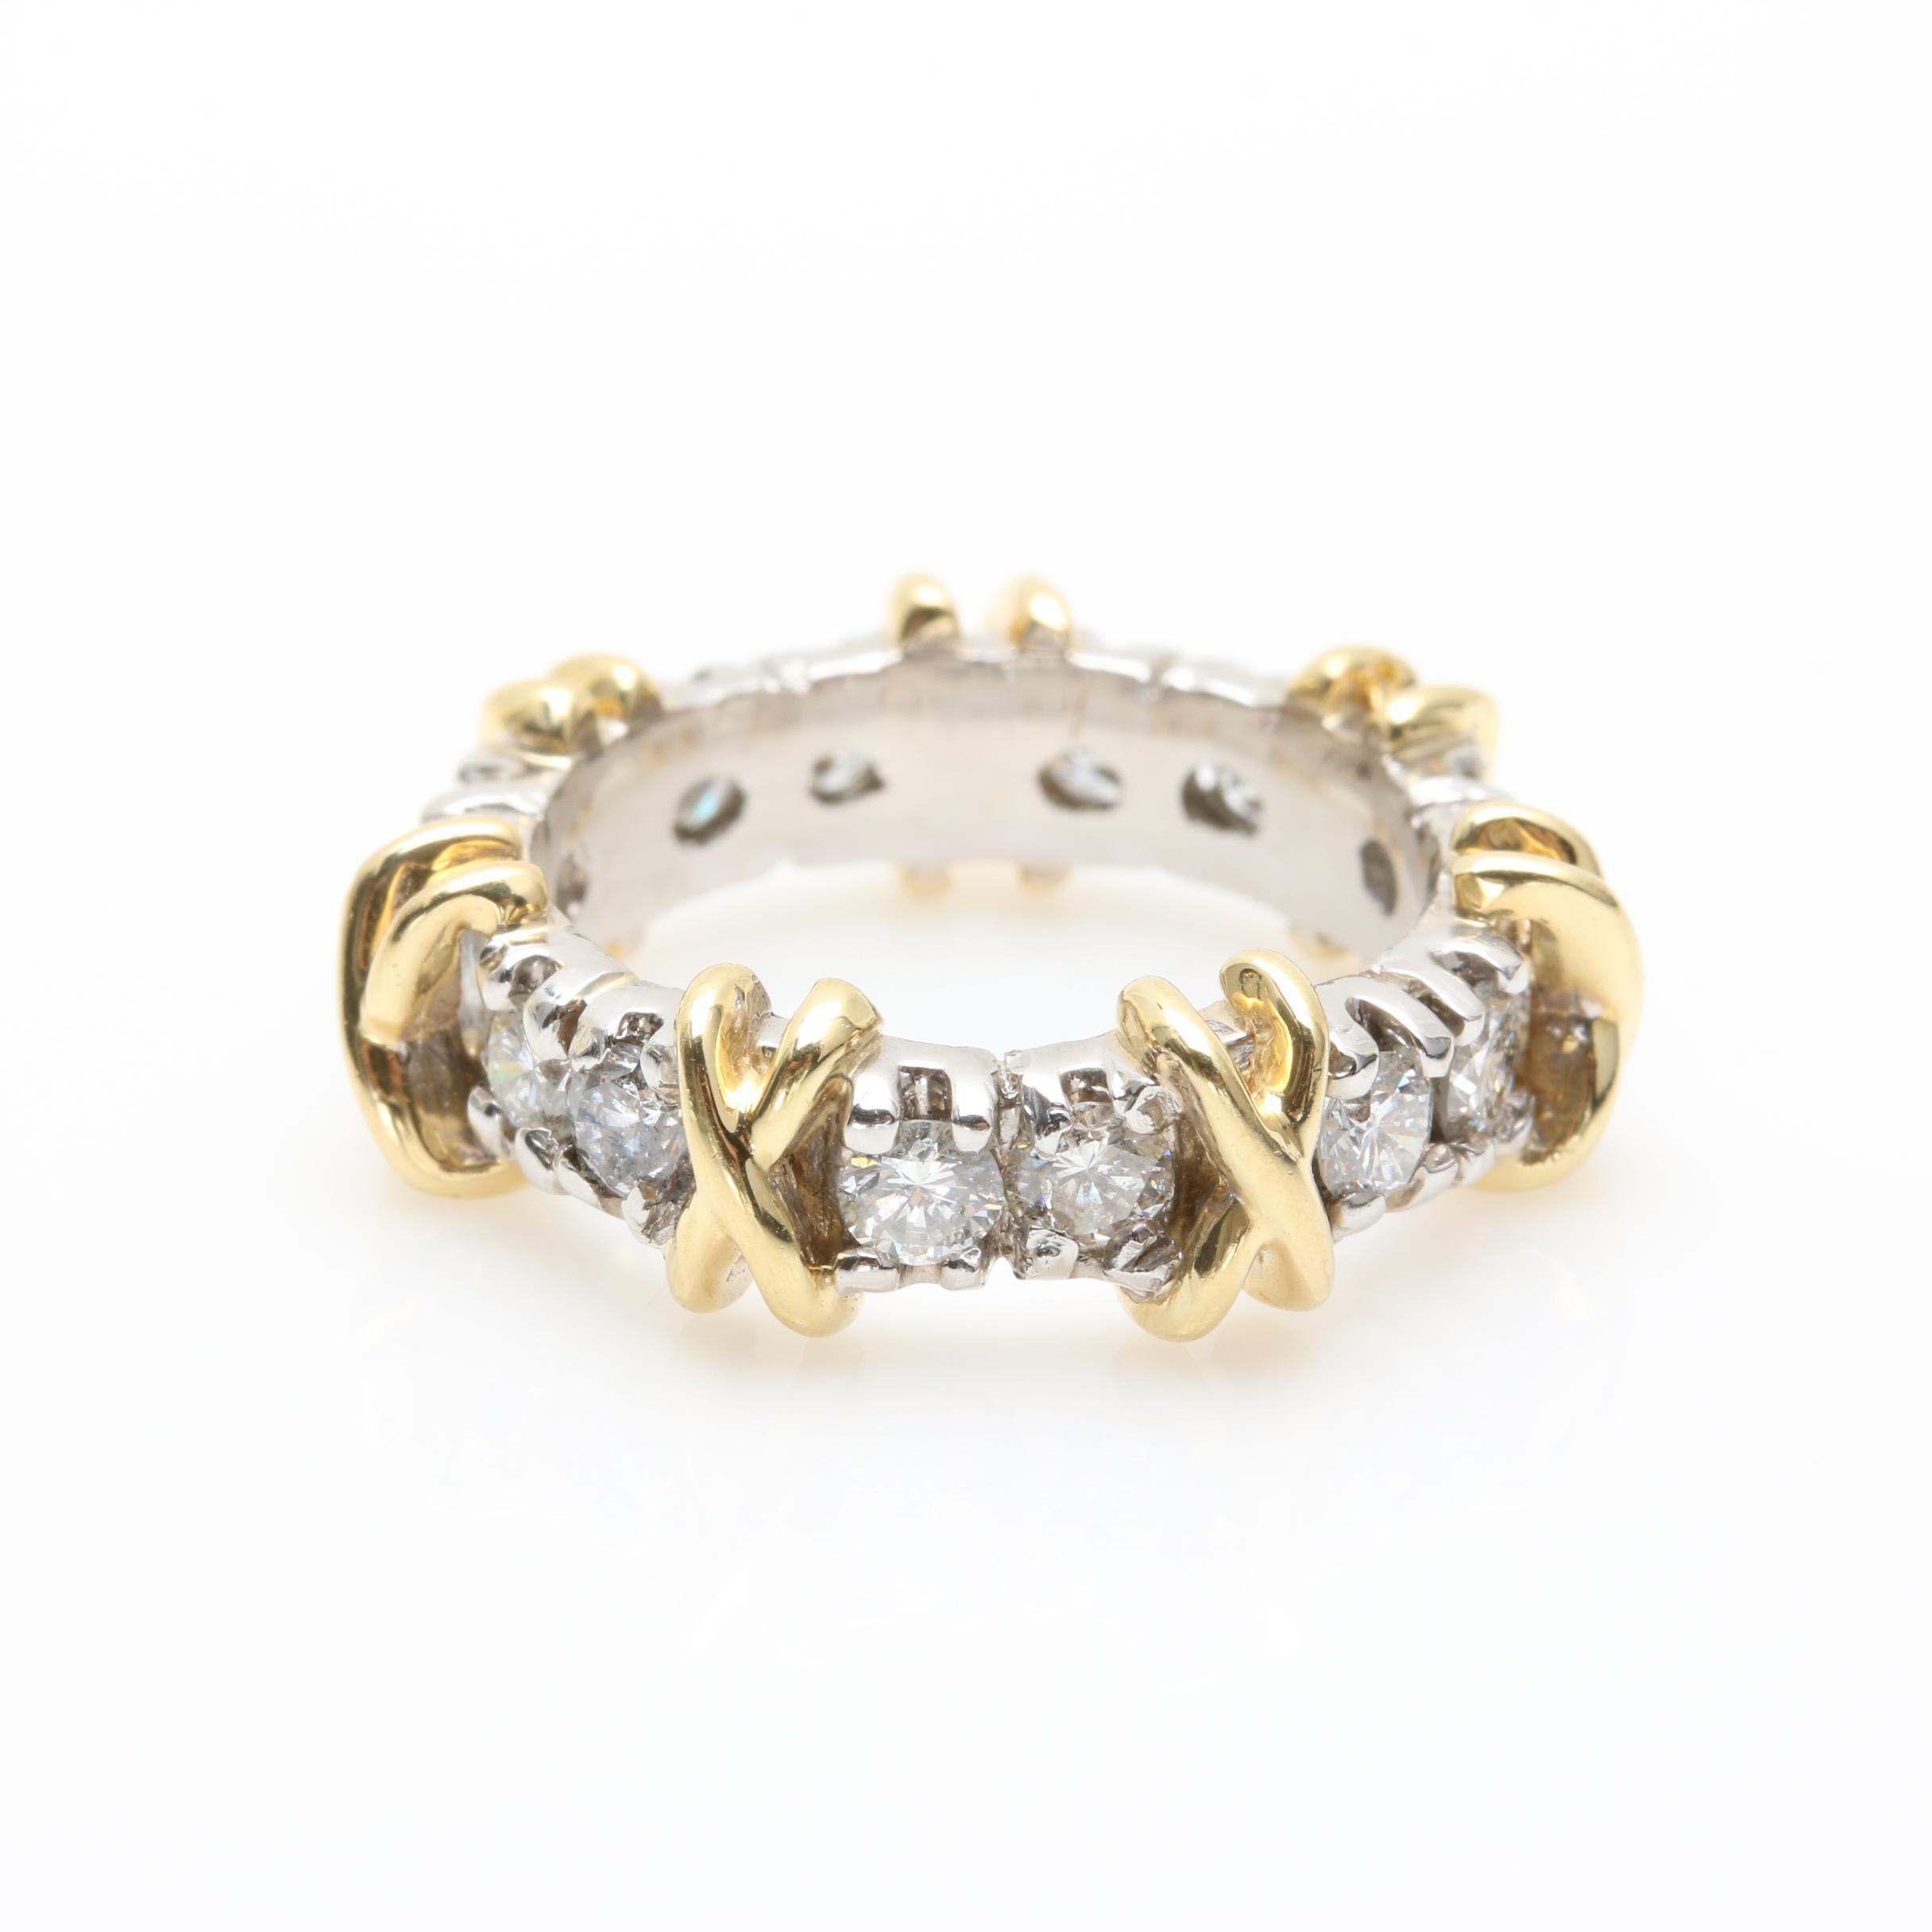 14K Yellow Gold and Platinum 1.33 CTW Diamond Ring